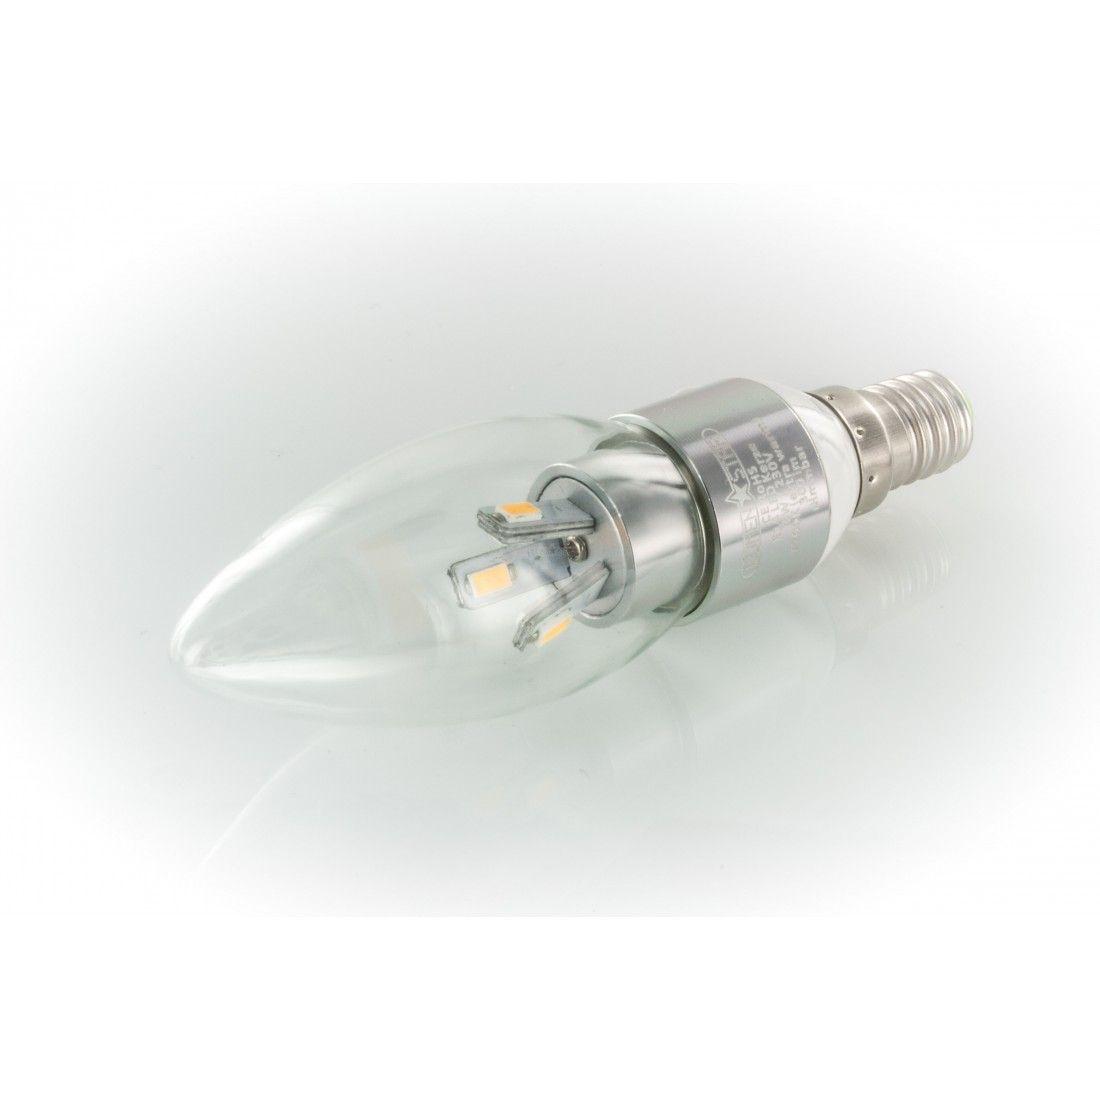 e14 led kerze kaufen  LED Lampen von der größten E ...